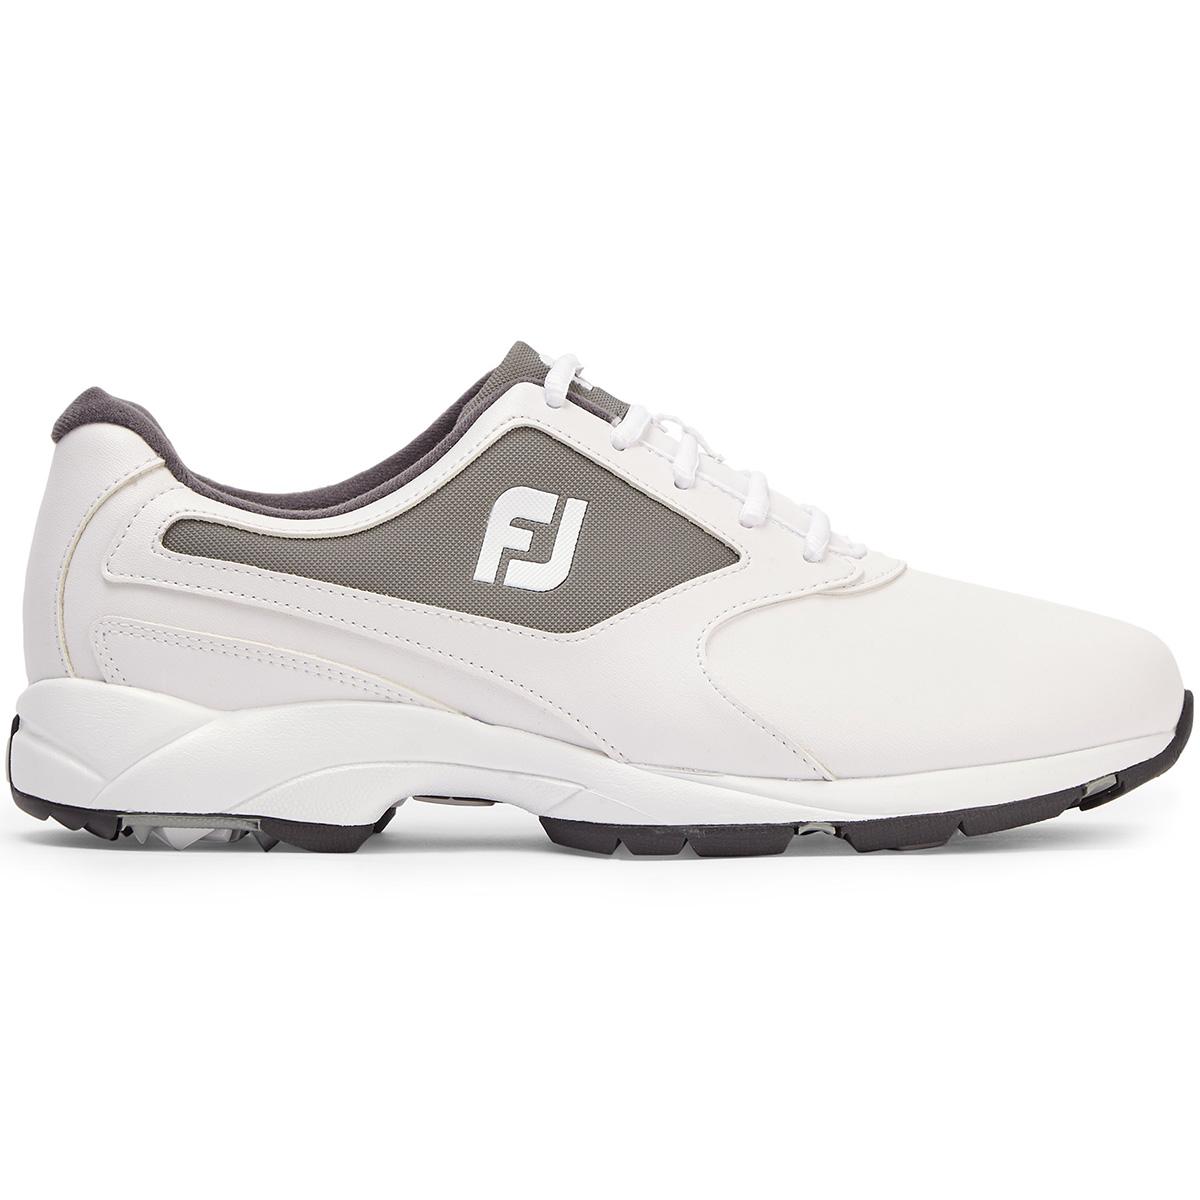 FootJoy Athletics Shoes | Online Golf